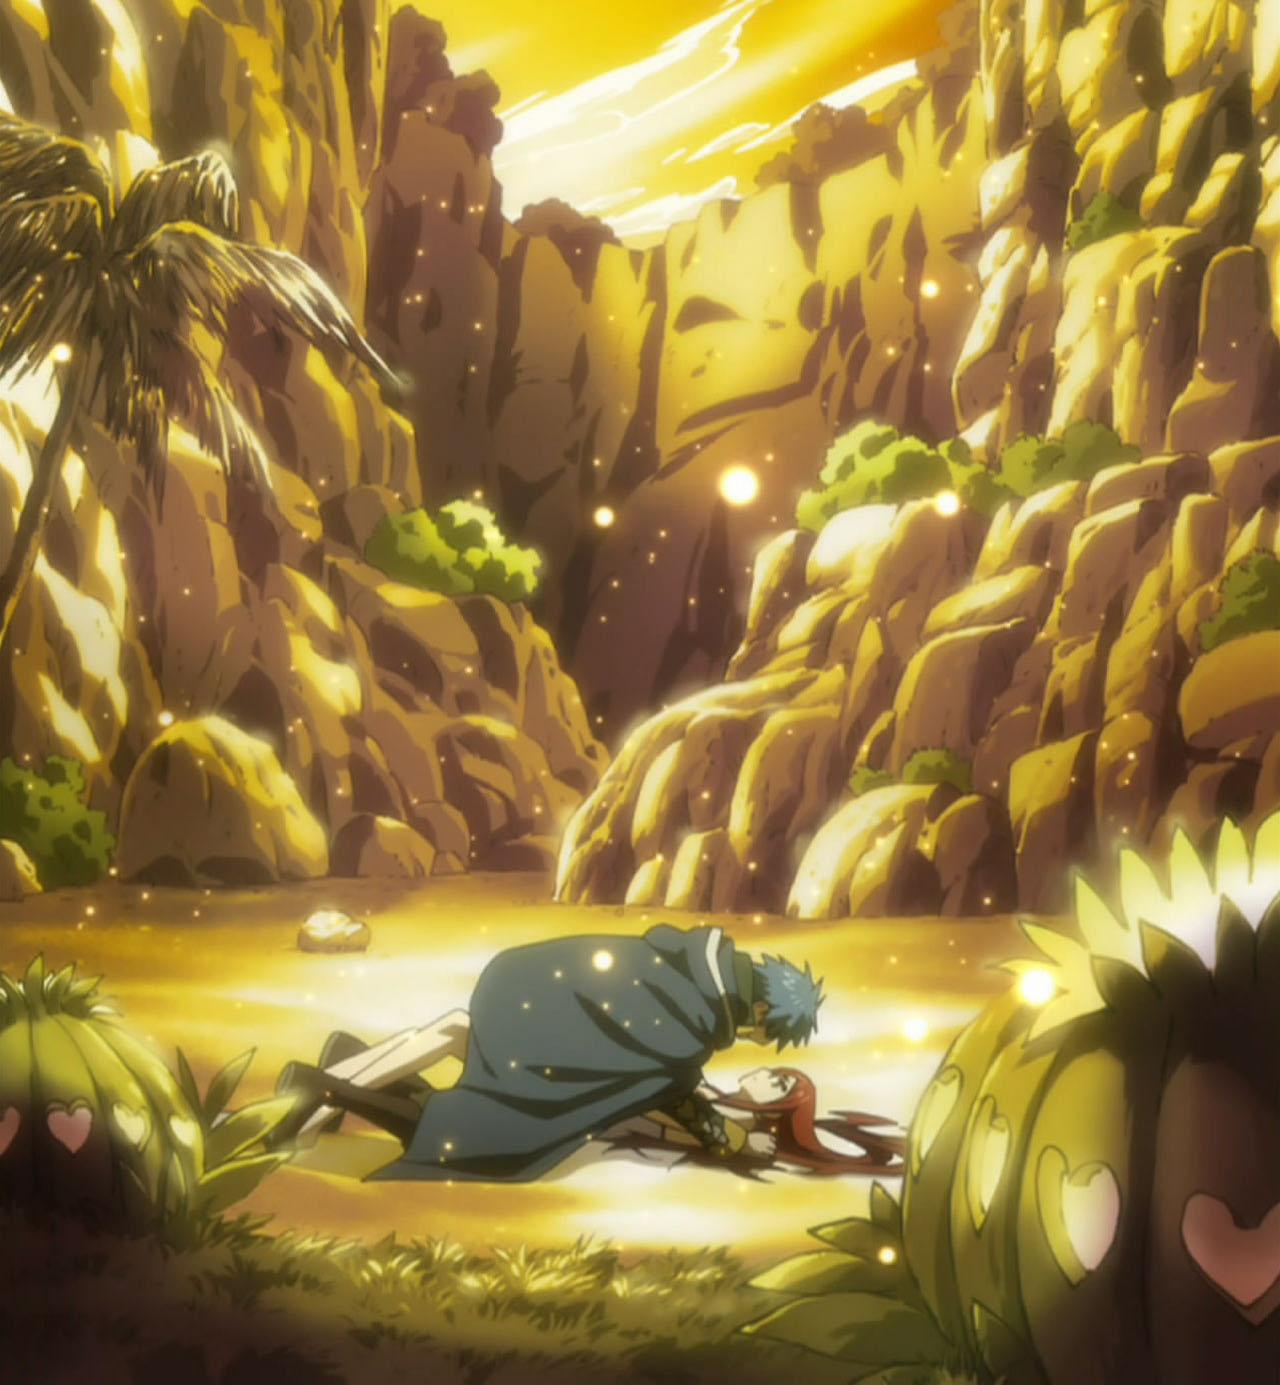 Jerza | Fairy Tail Cou...